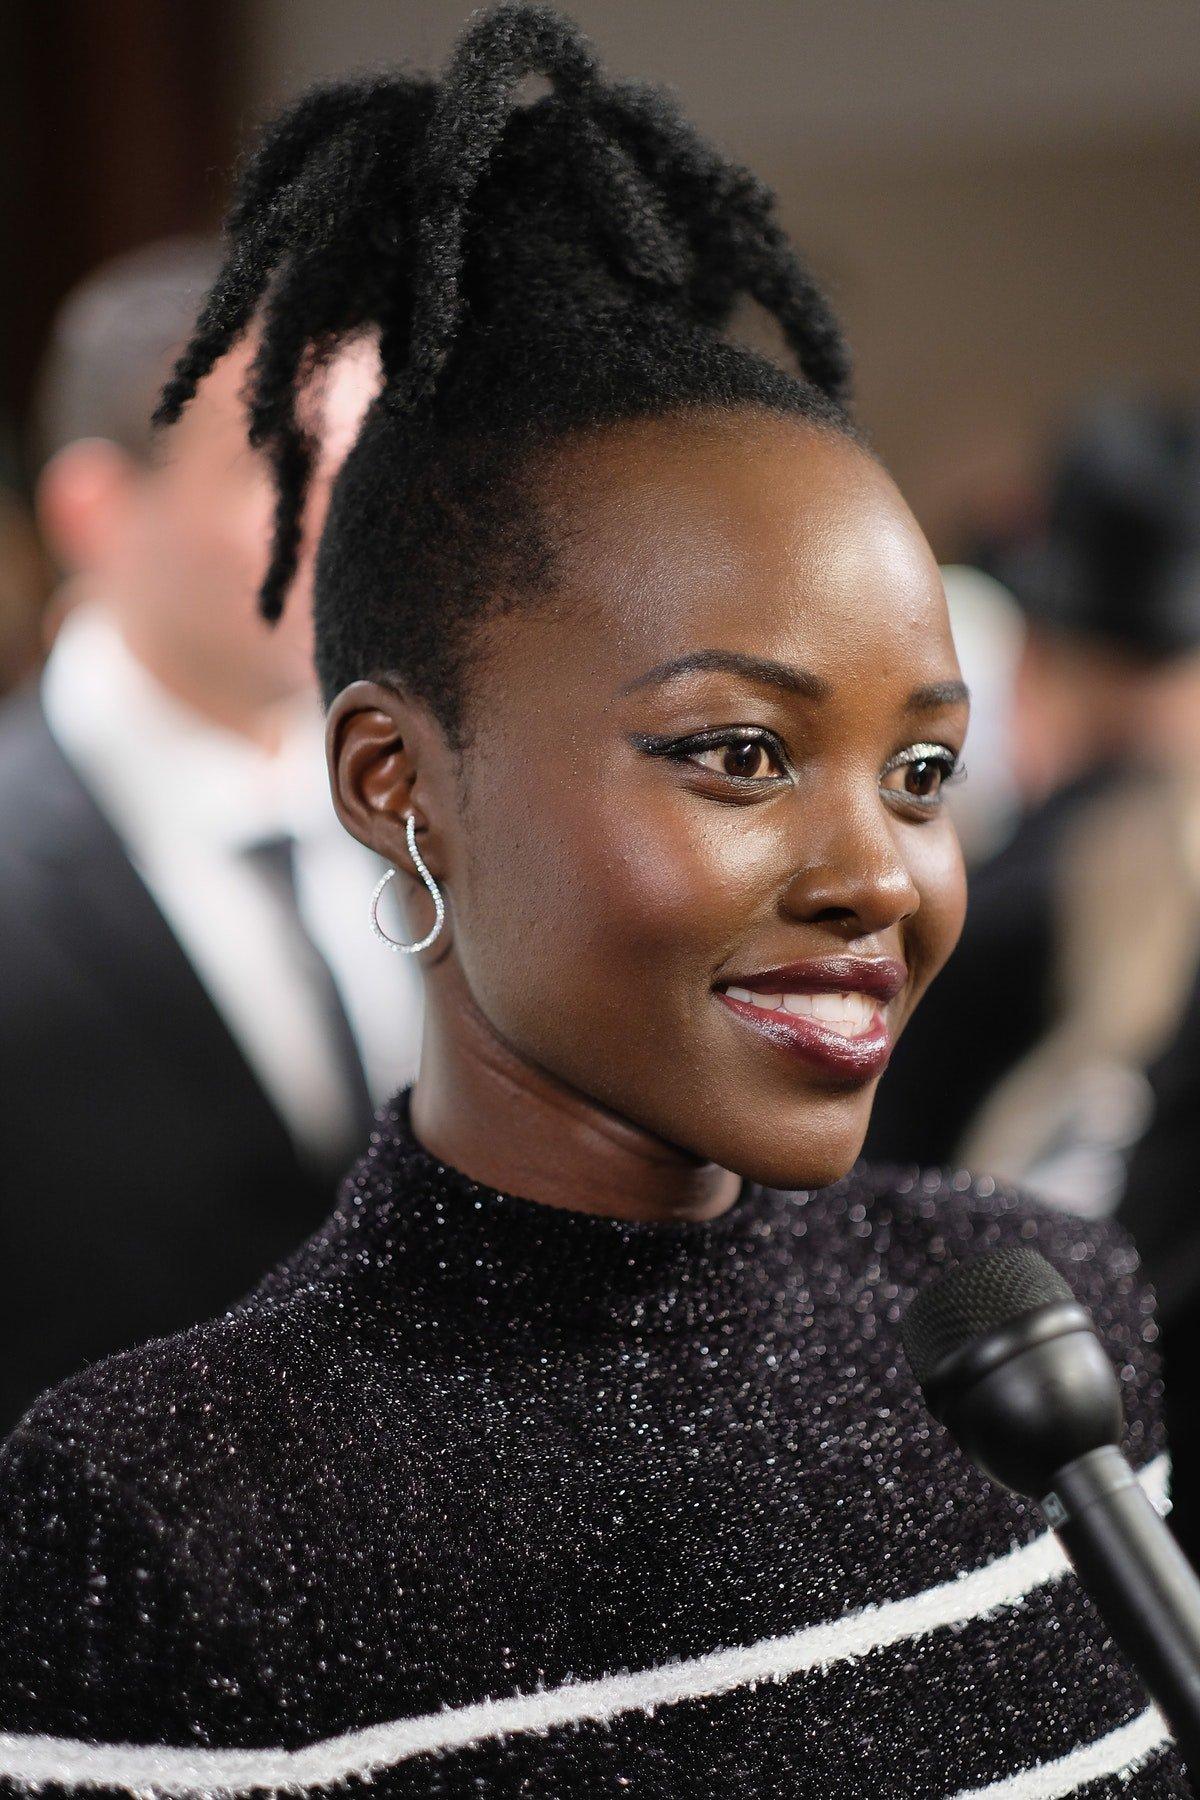 Lupita Nyong'o Looked Like A 'Twilight' Vampire At The Premiere Of 'Us'